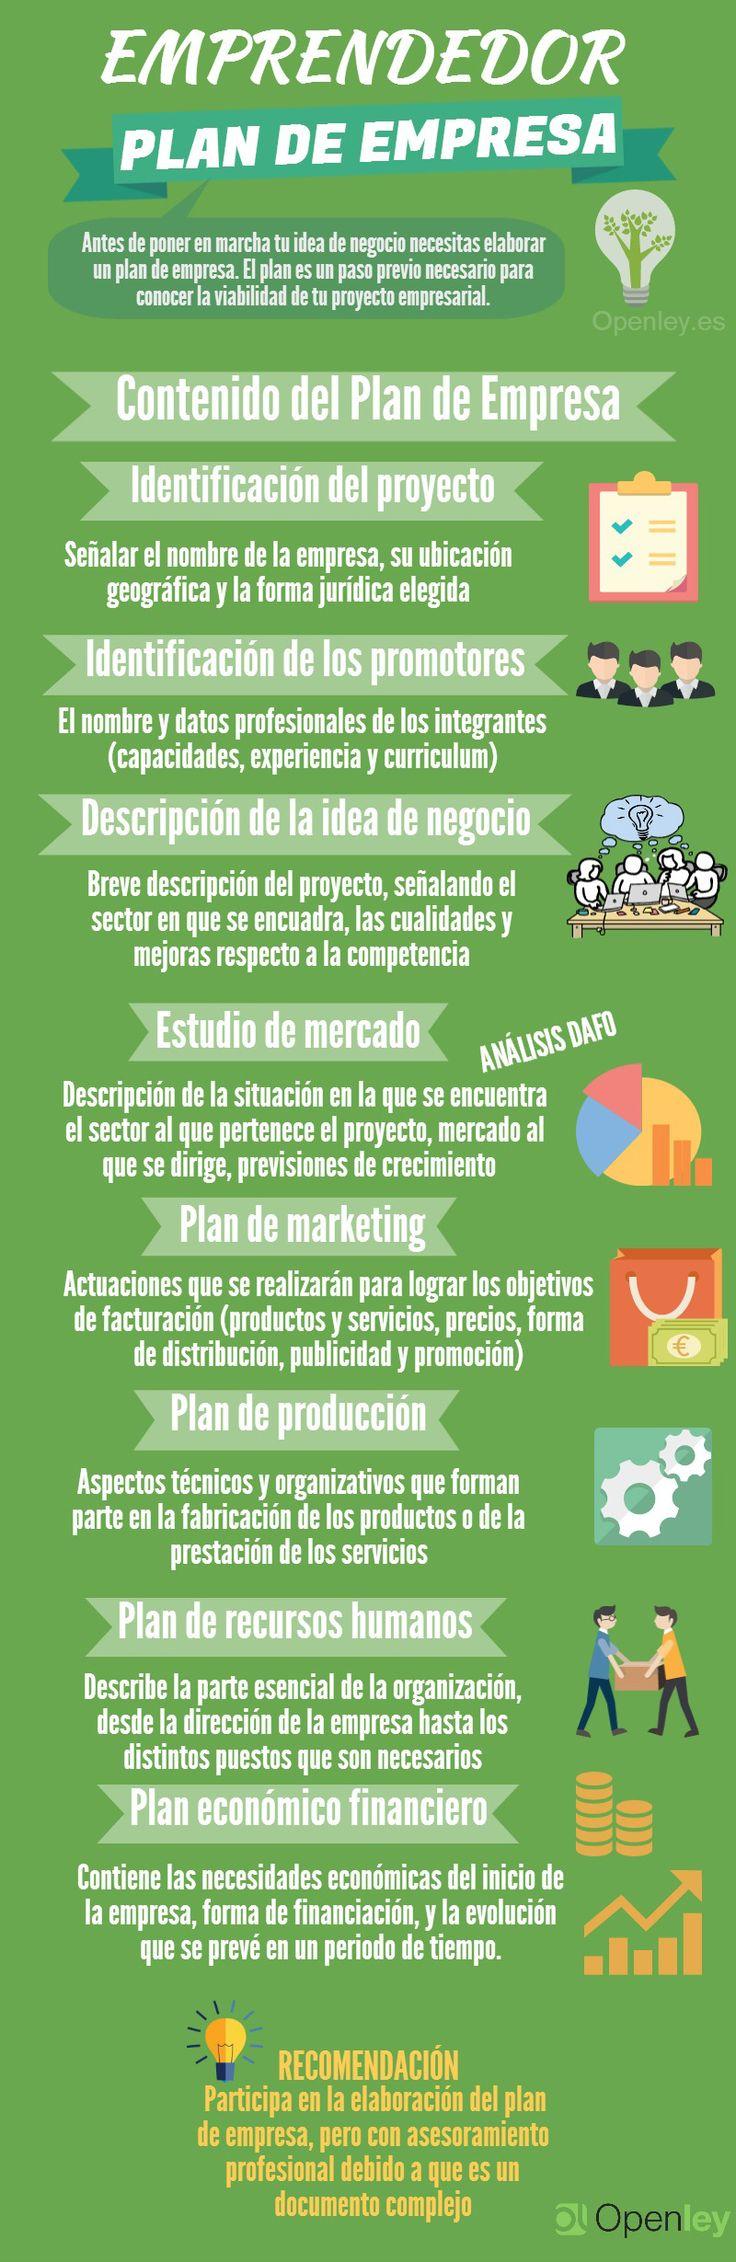 Plan de empresa #infografia #infographic #entrepreneurship